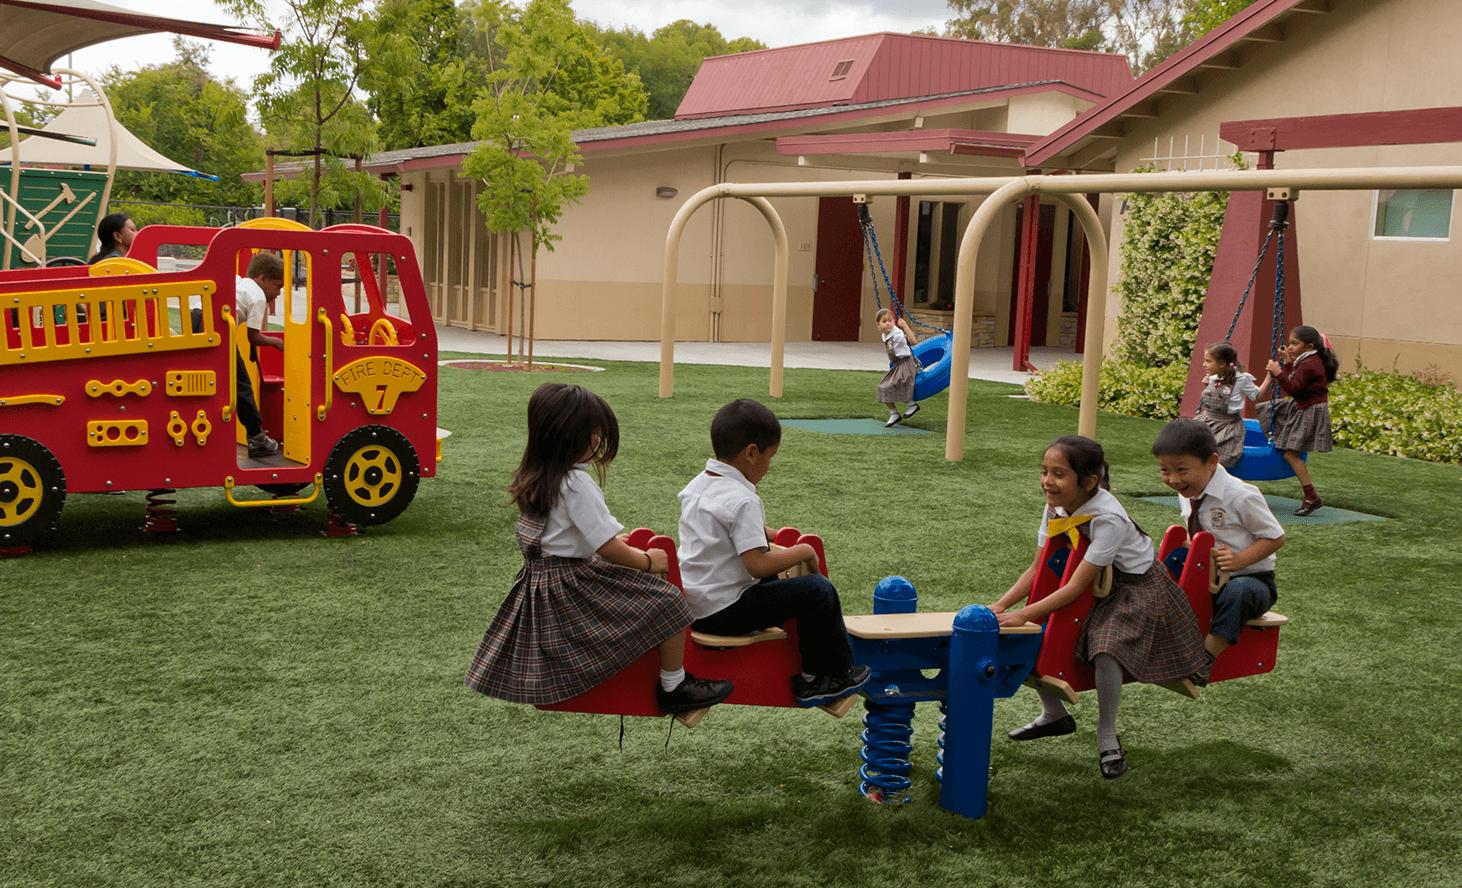 Seesaw | Challenger School - Middlefield | Private School In Palo Alto, California